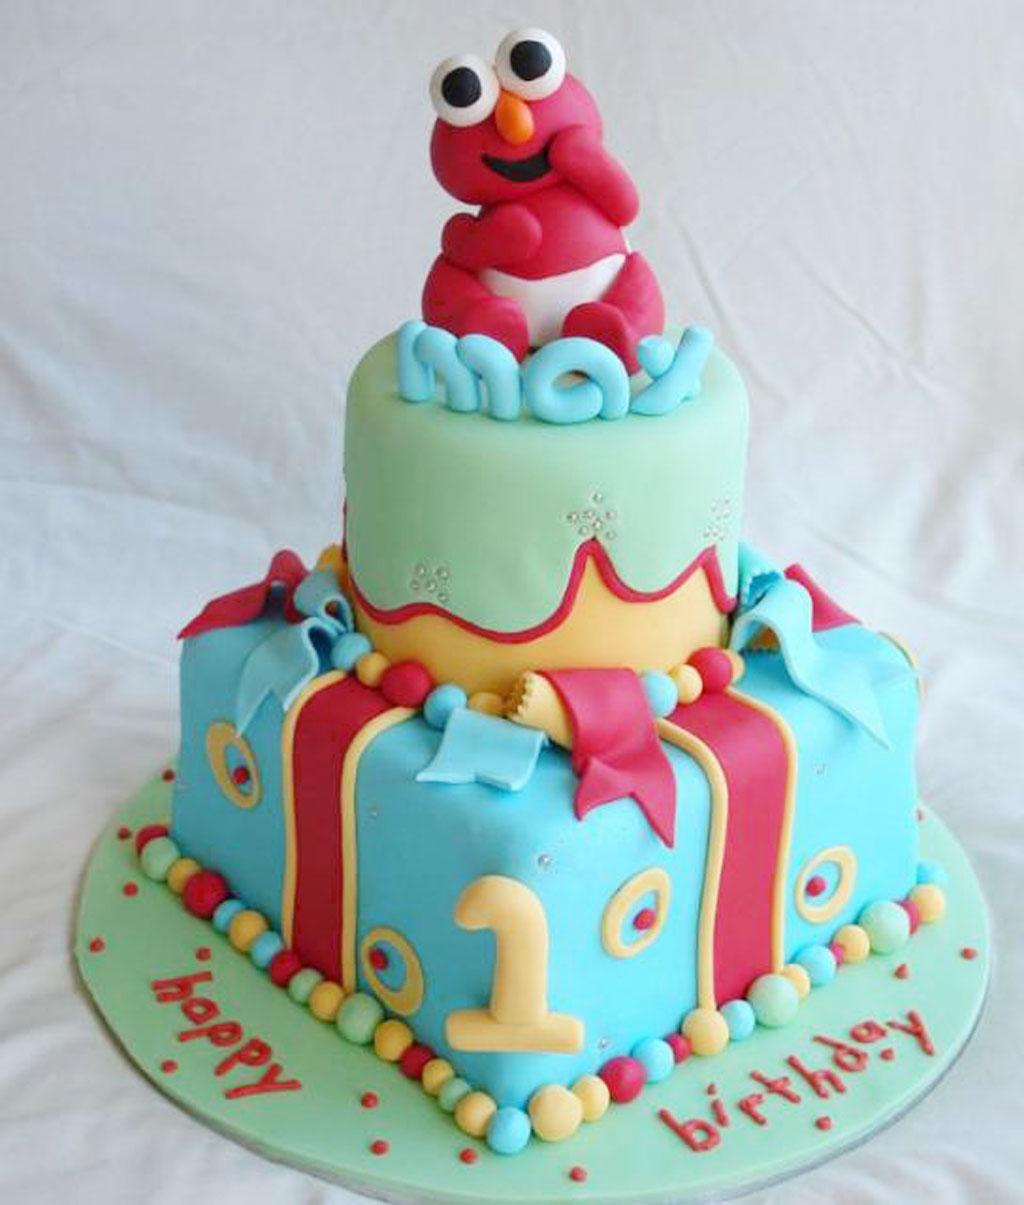 Elmo Birthday Cakes Design 1 Birthday Cake Cake Ideas by